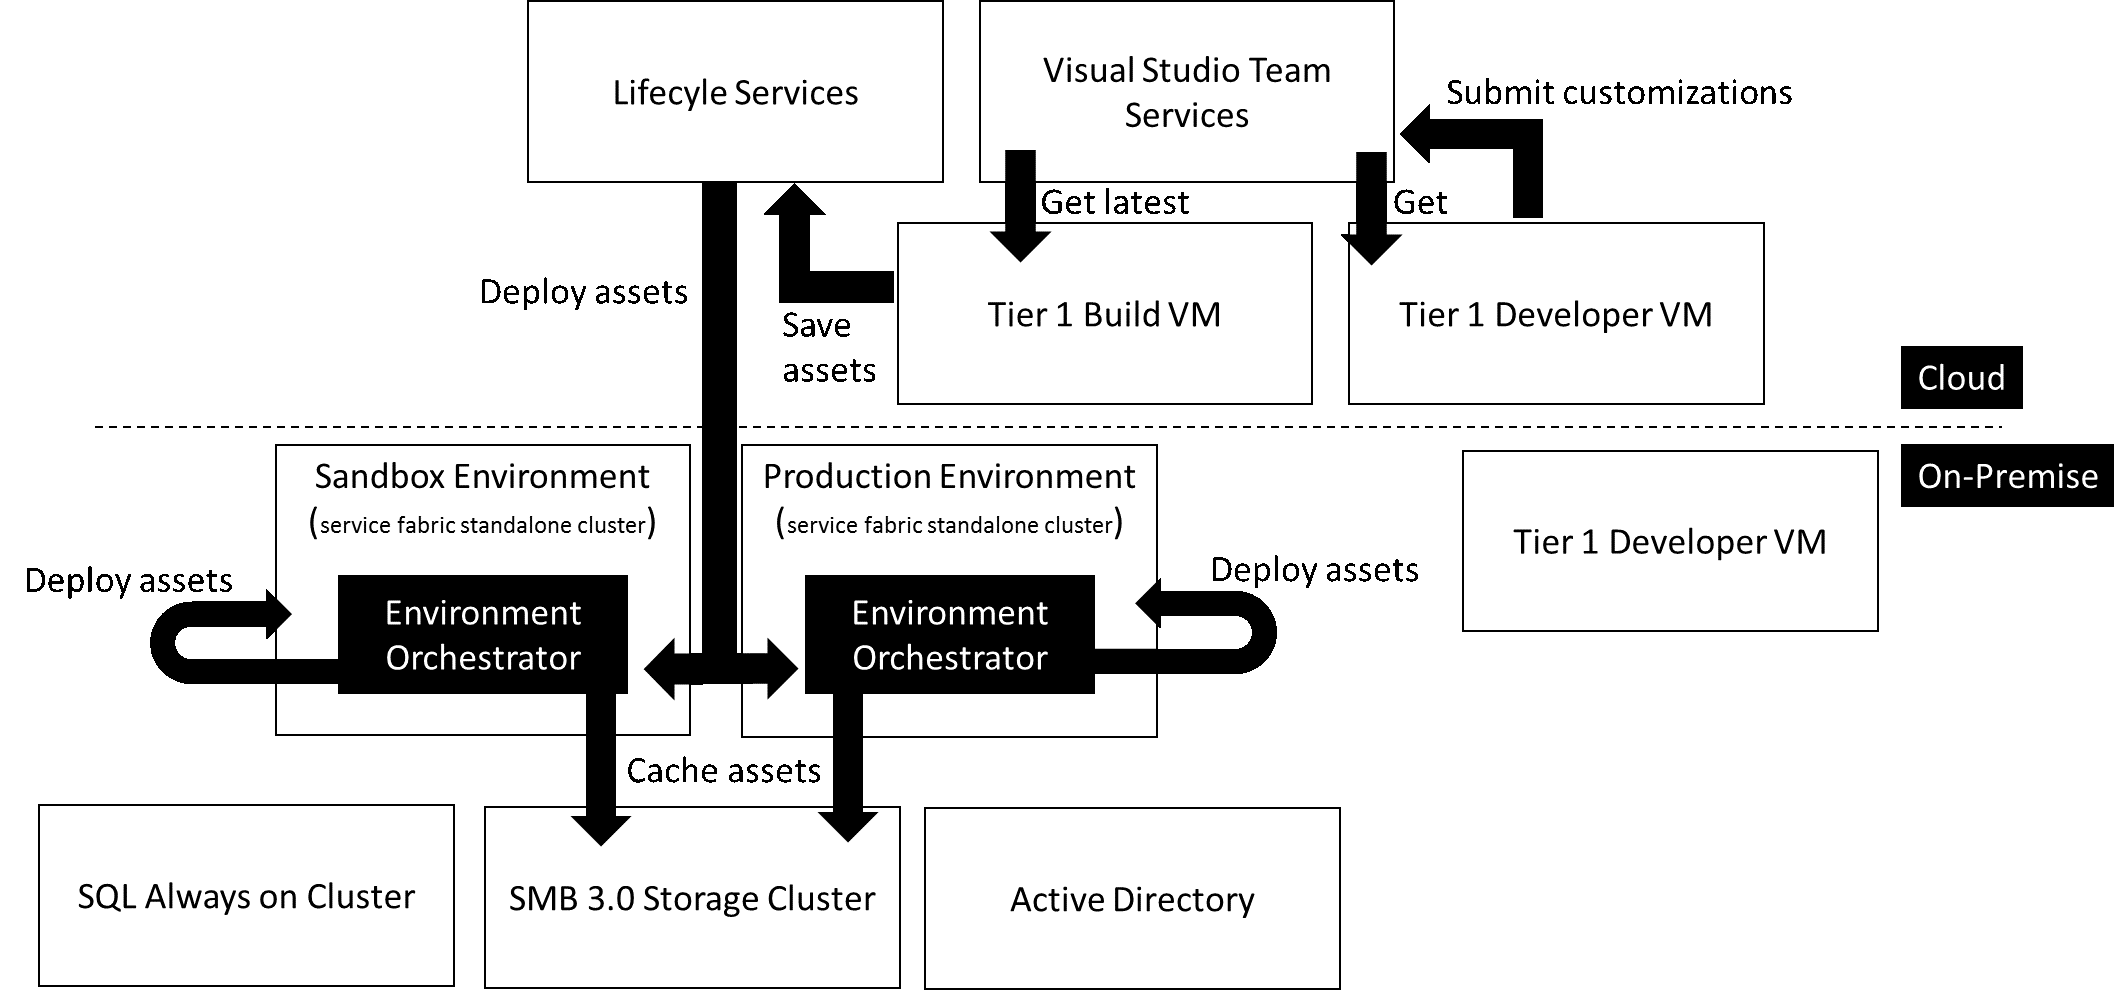 on-premises deployment option